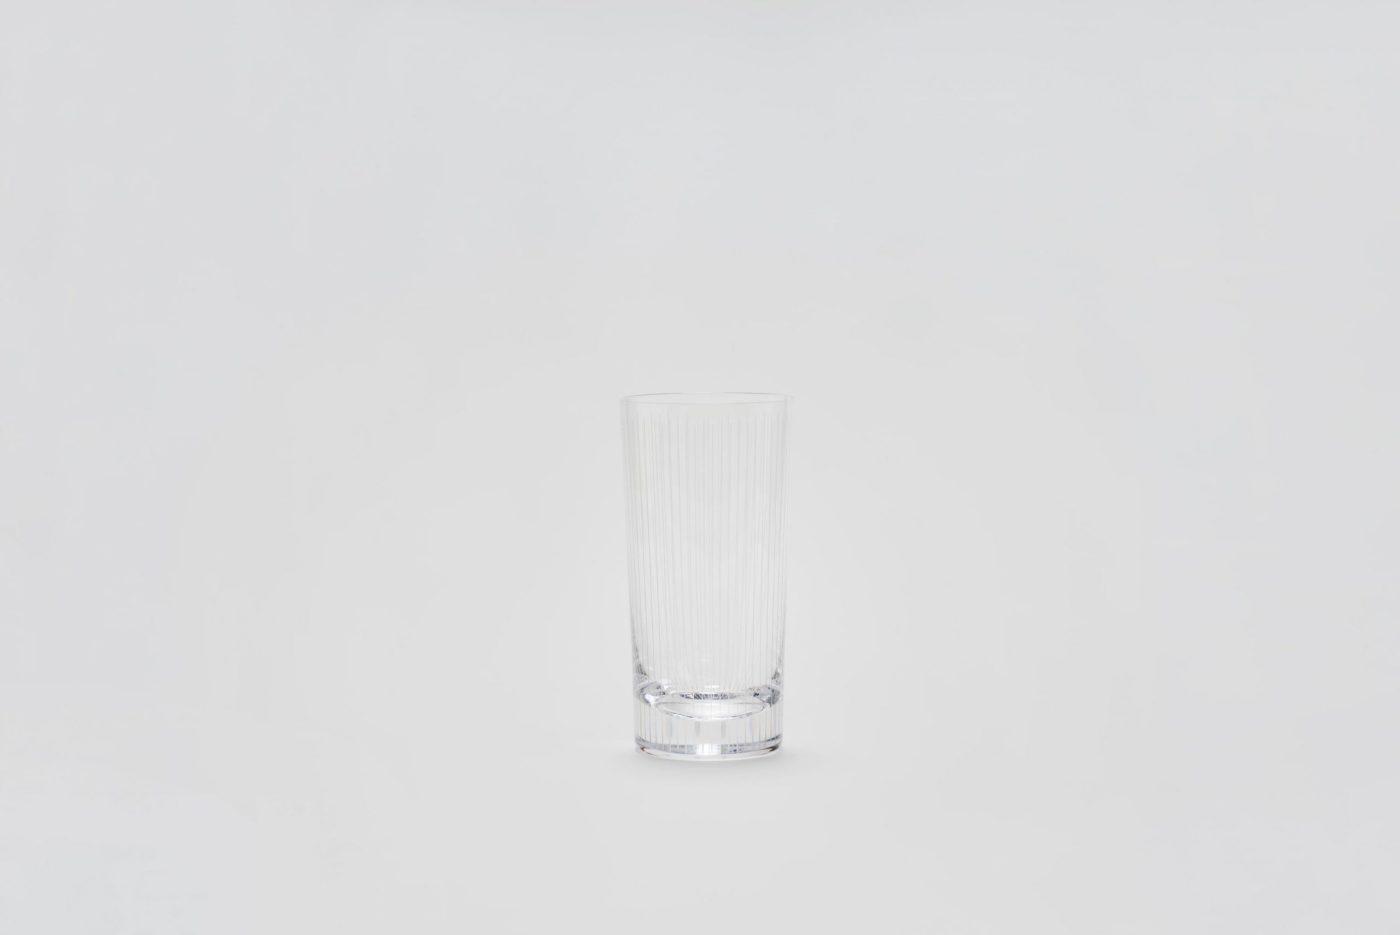 04 MYKILOS RAY GLASS TUMBLER HIGHBALL CRYSTAL scaled